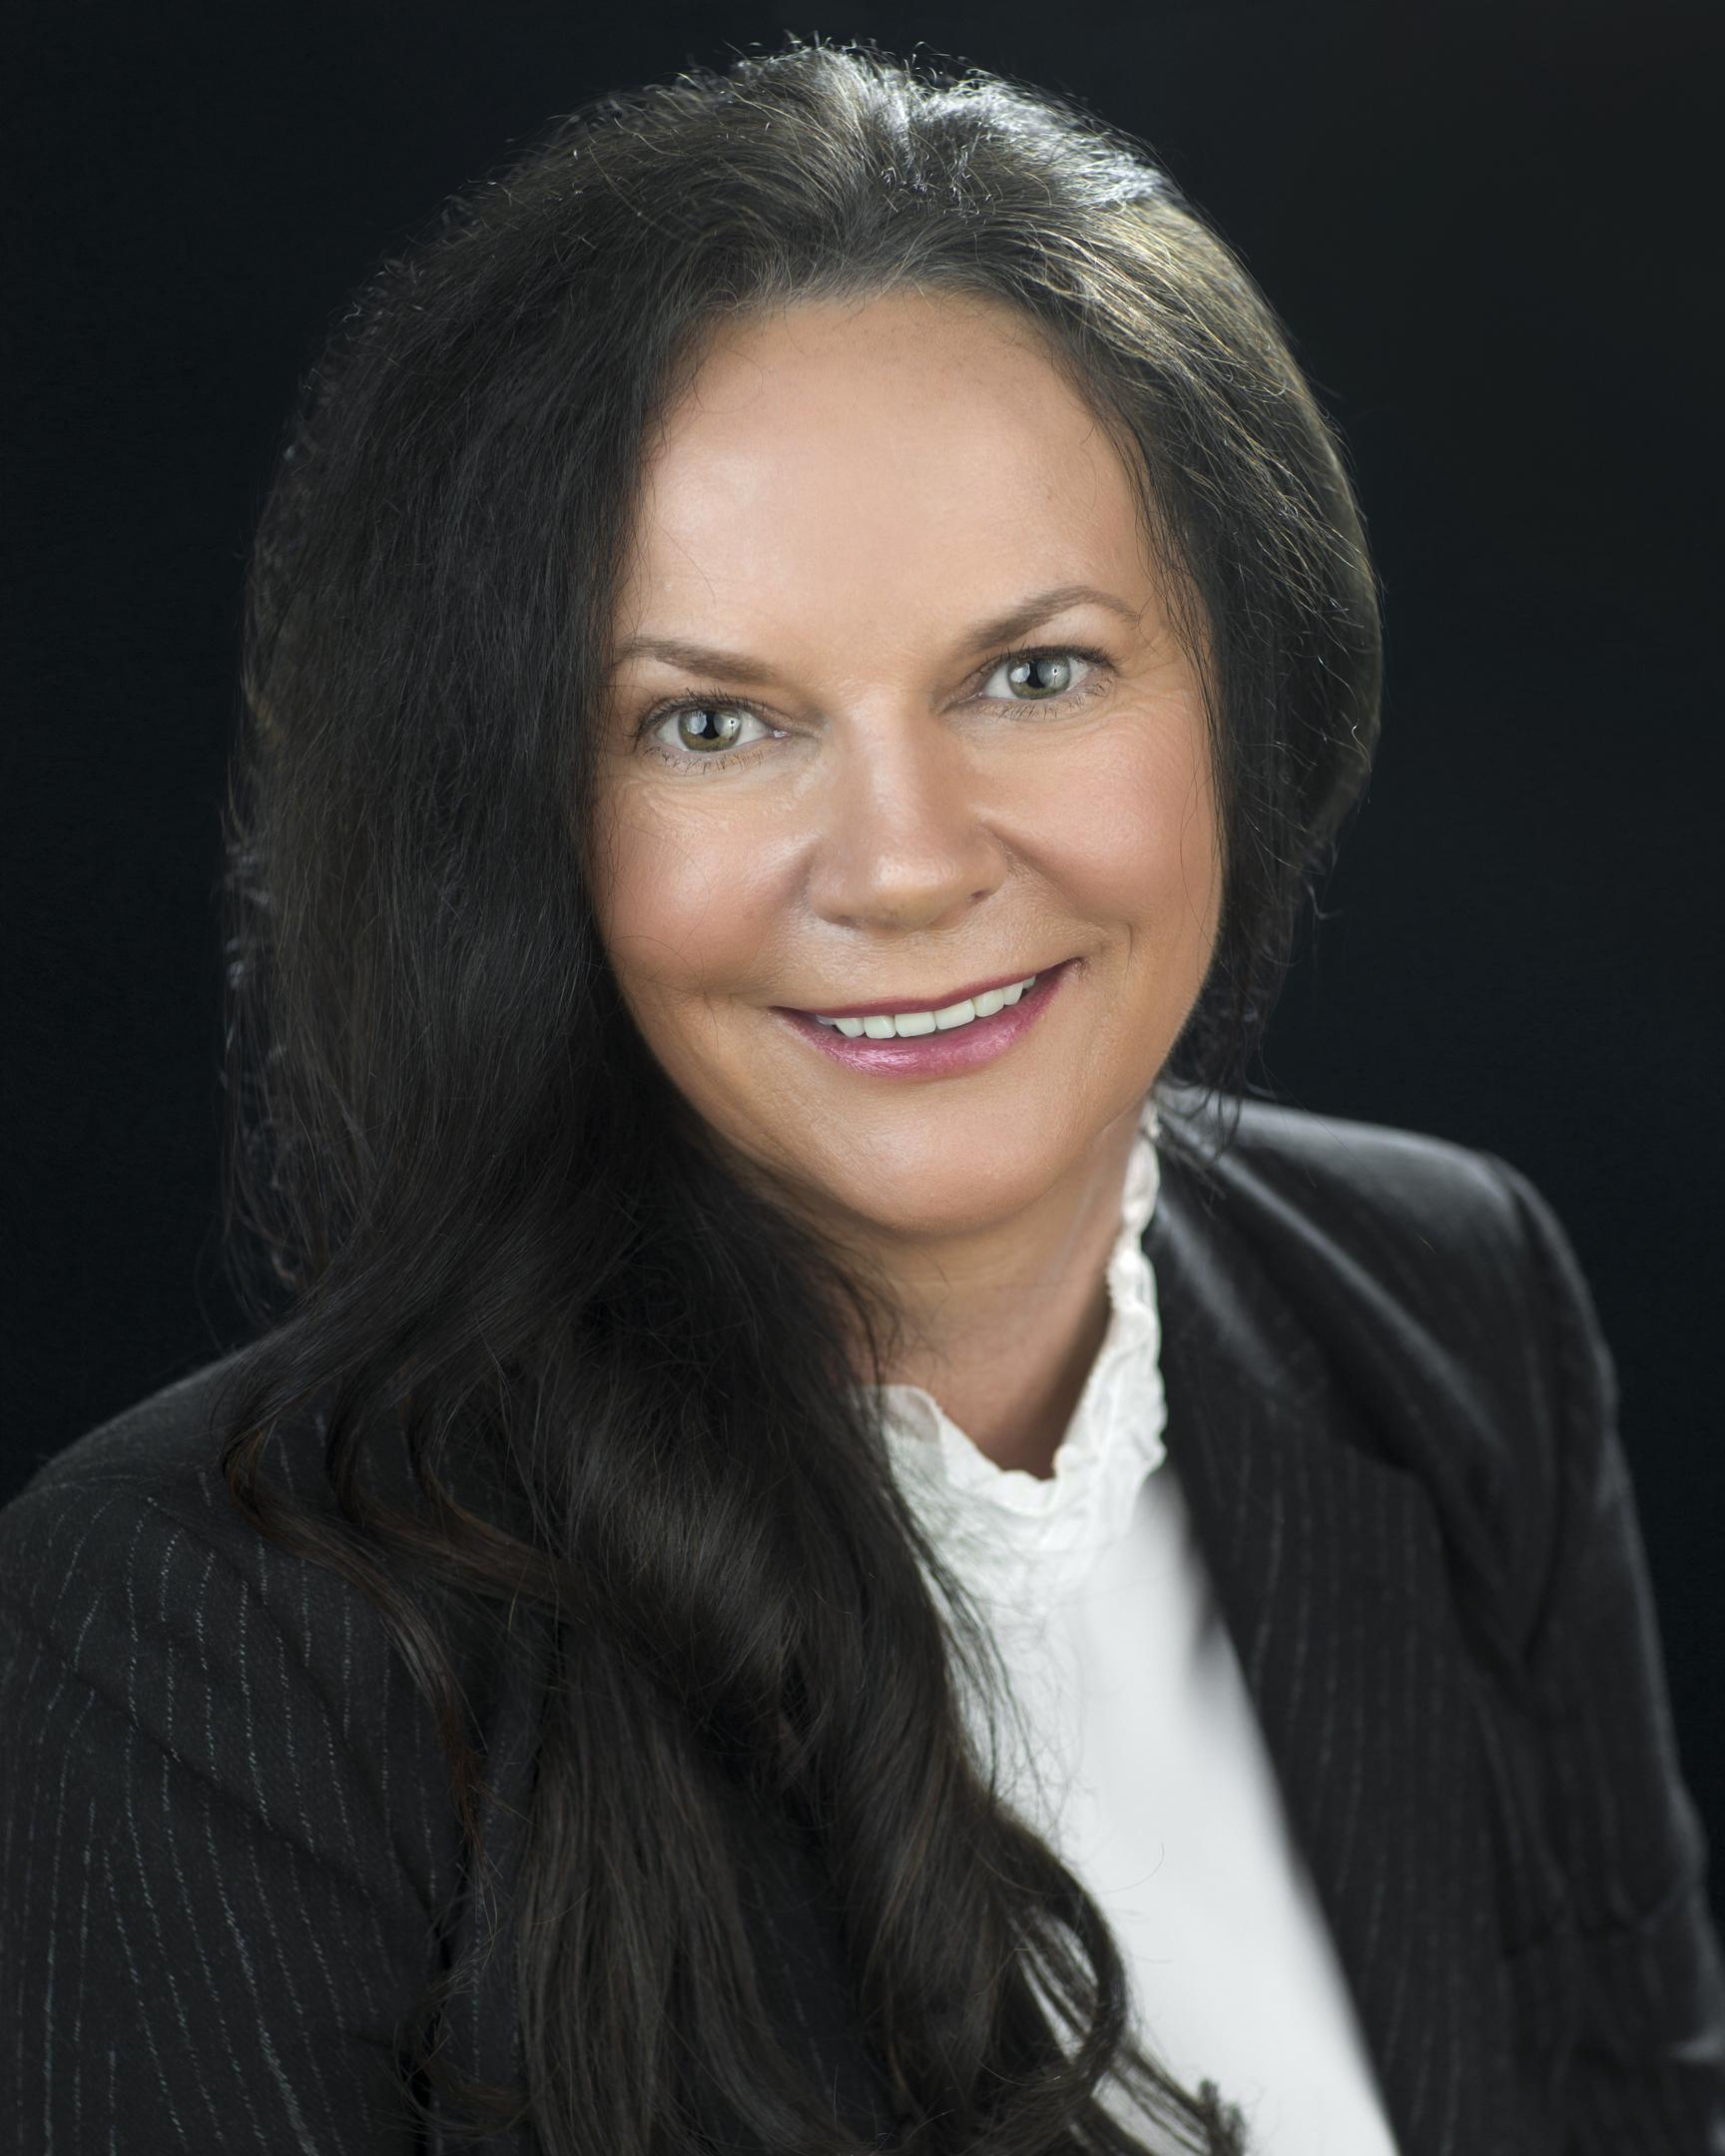 Suzanne Munro